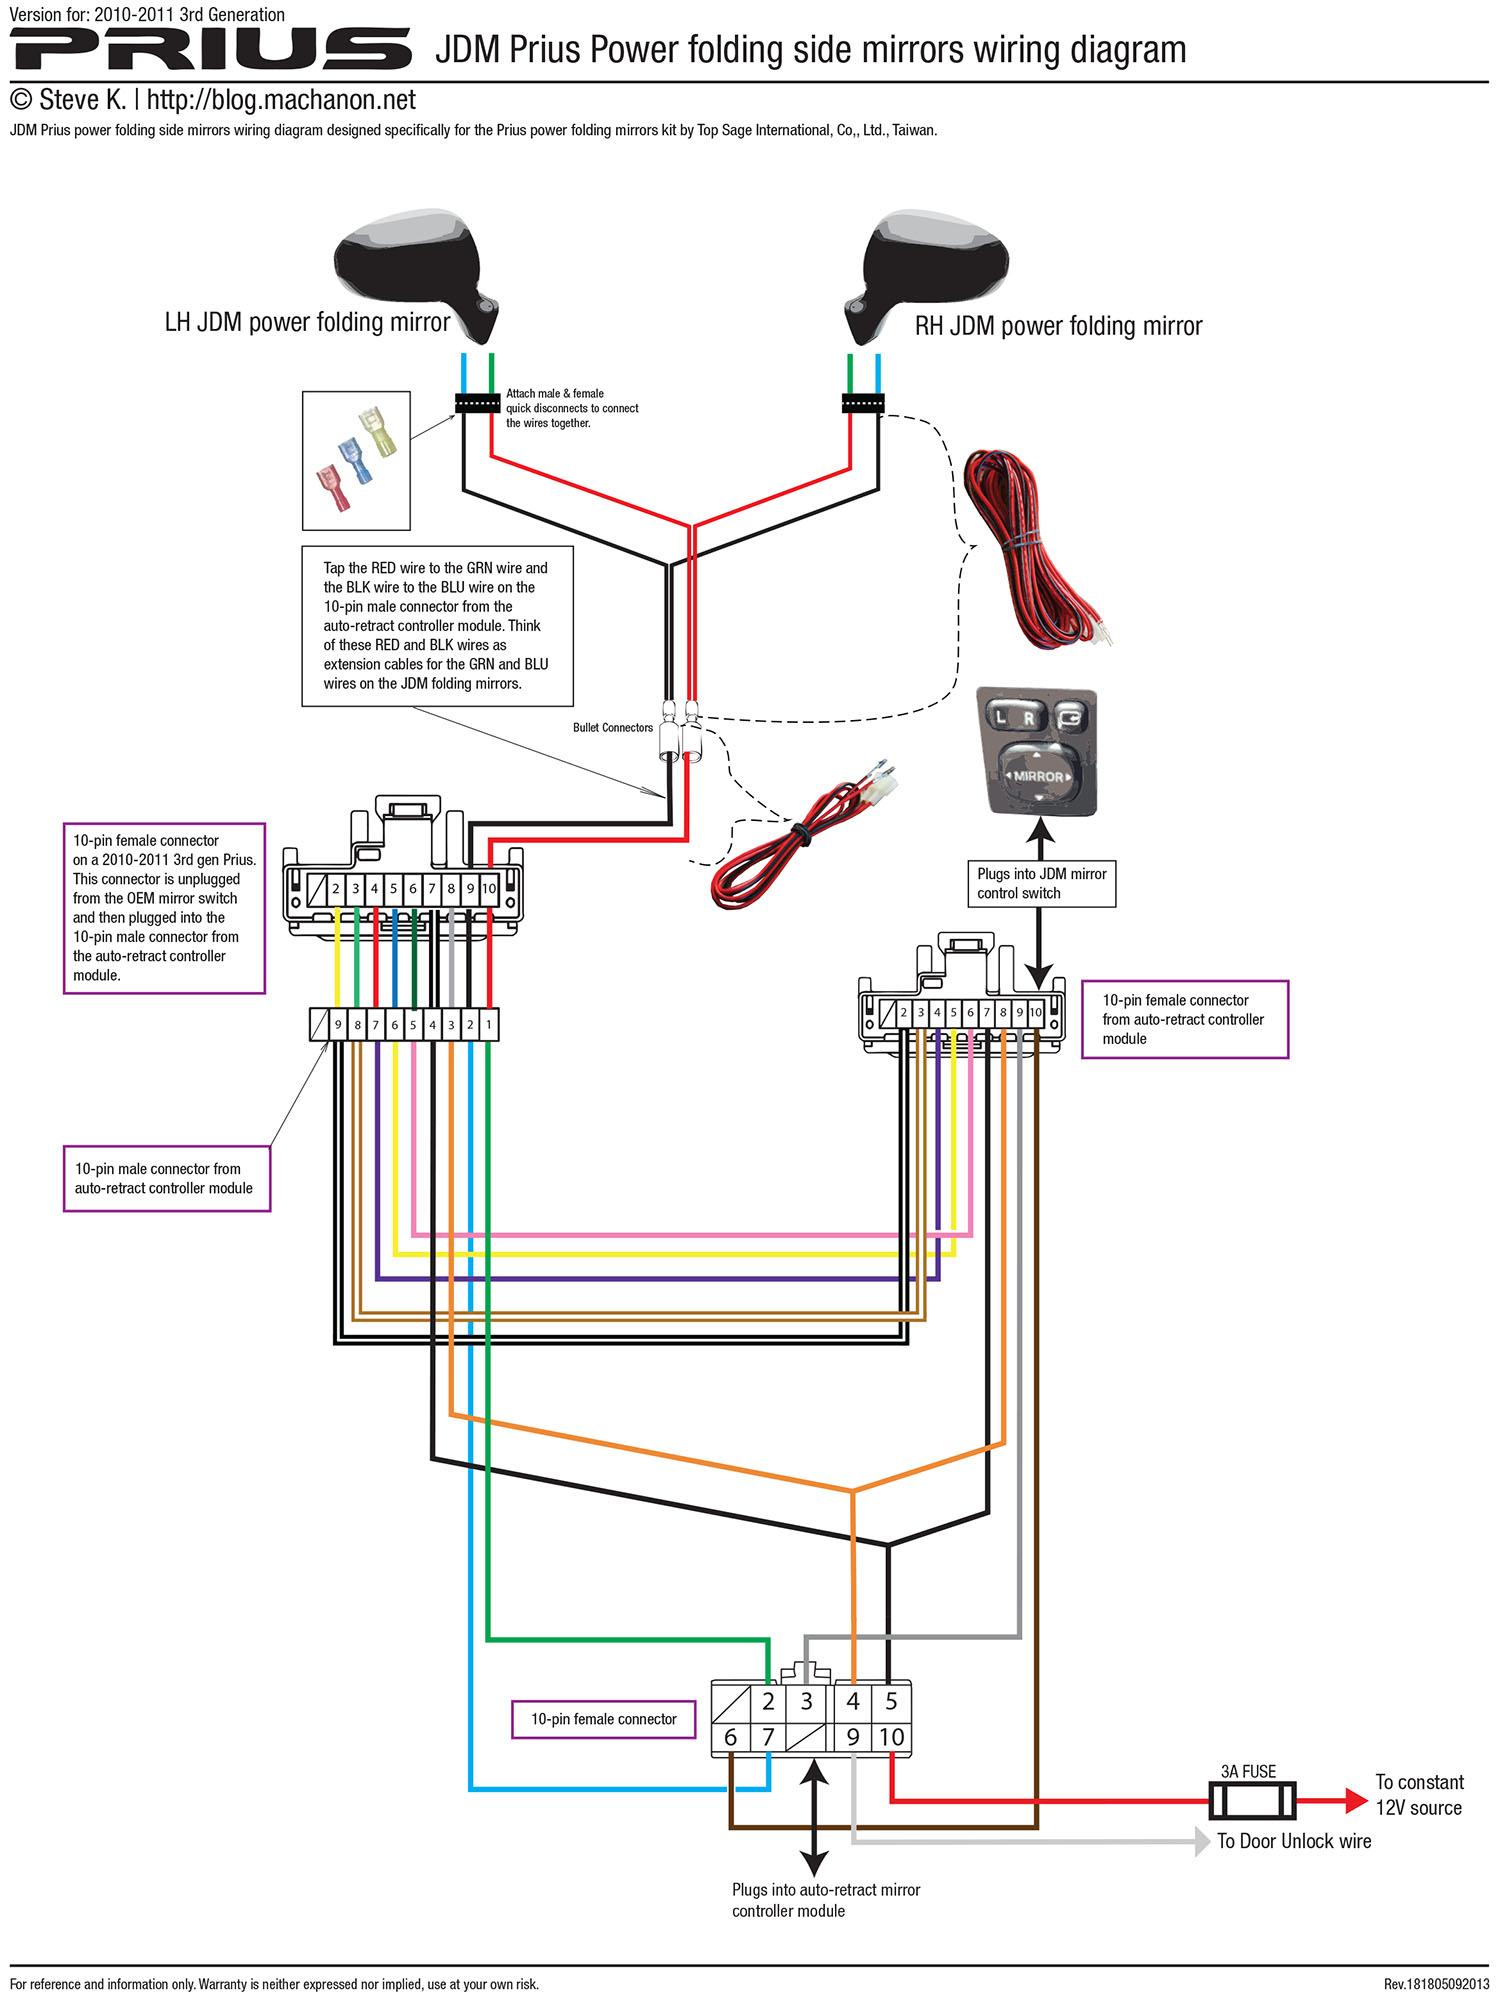 2010-2011 3rd gen Prius JDM power folding side mirror wiring diagram (using kit by Top Sage International, Co., Ltd.)